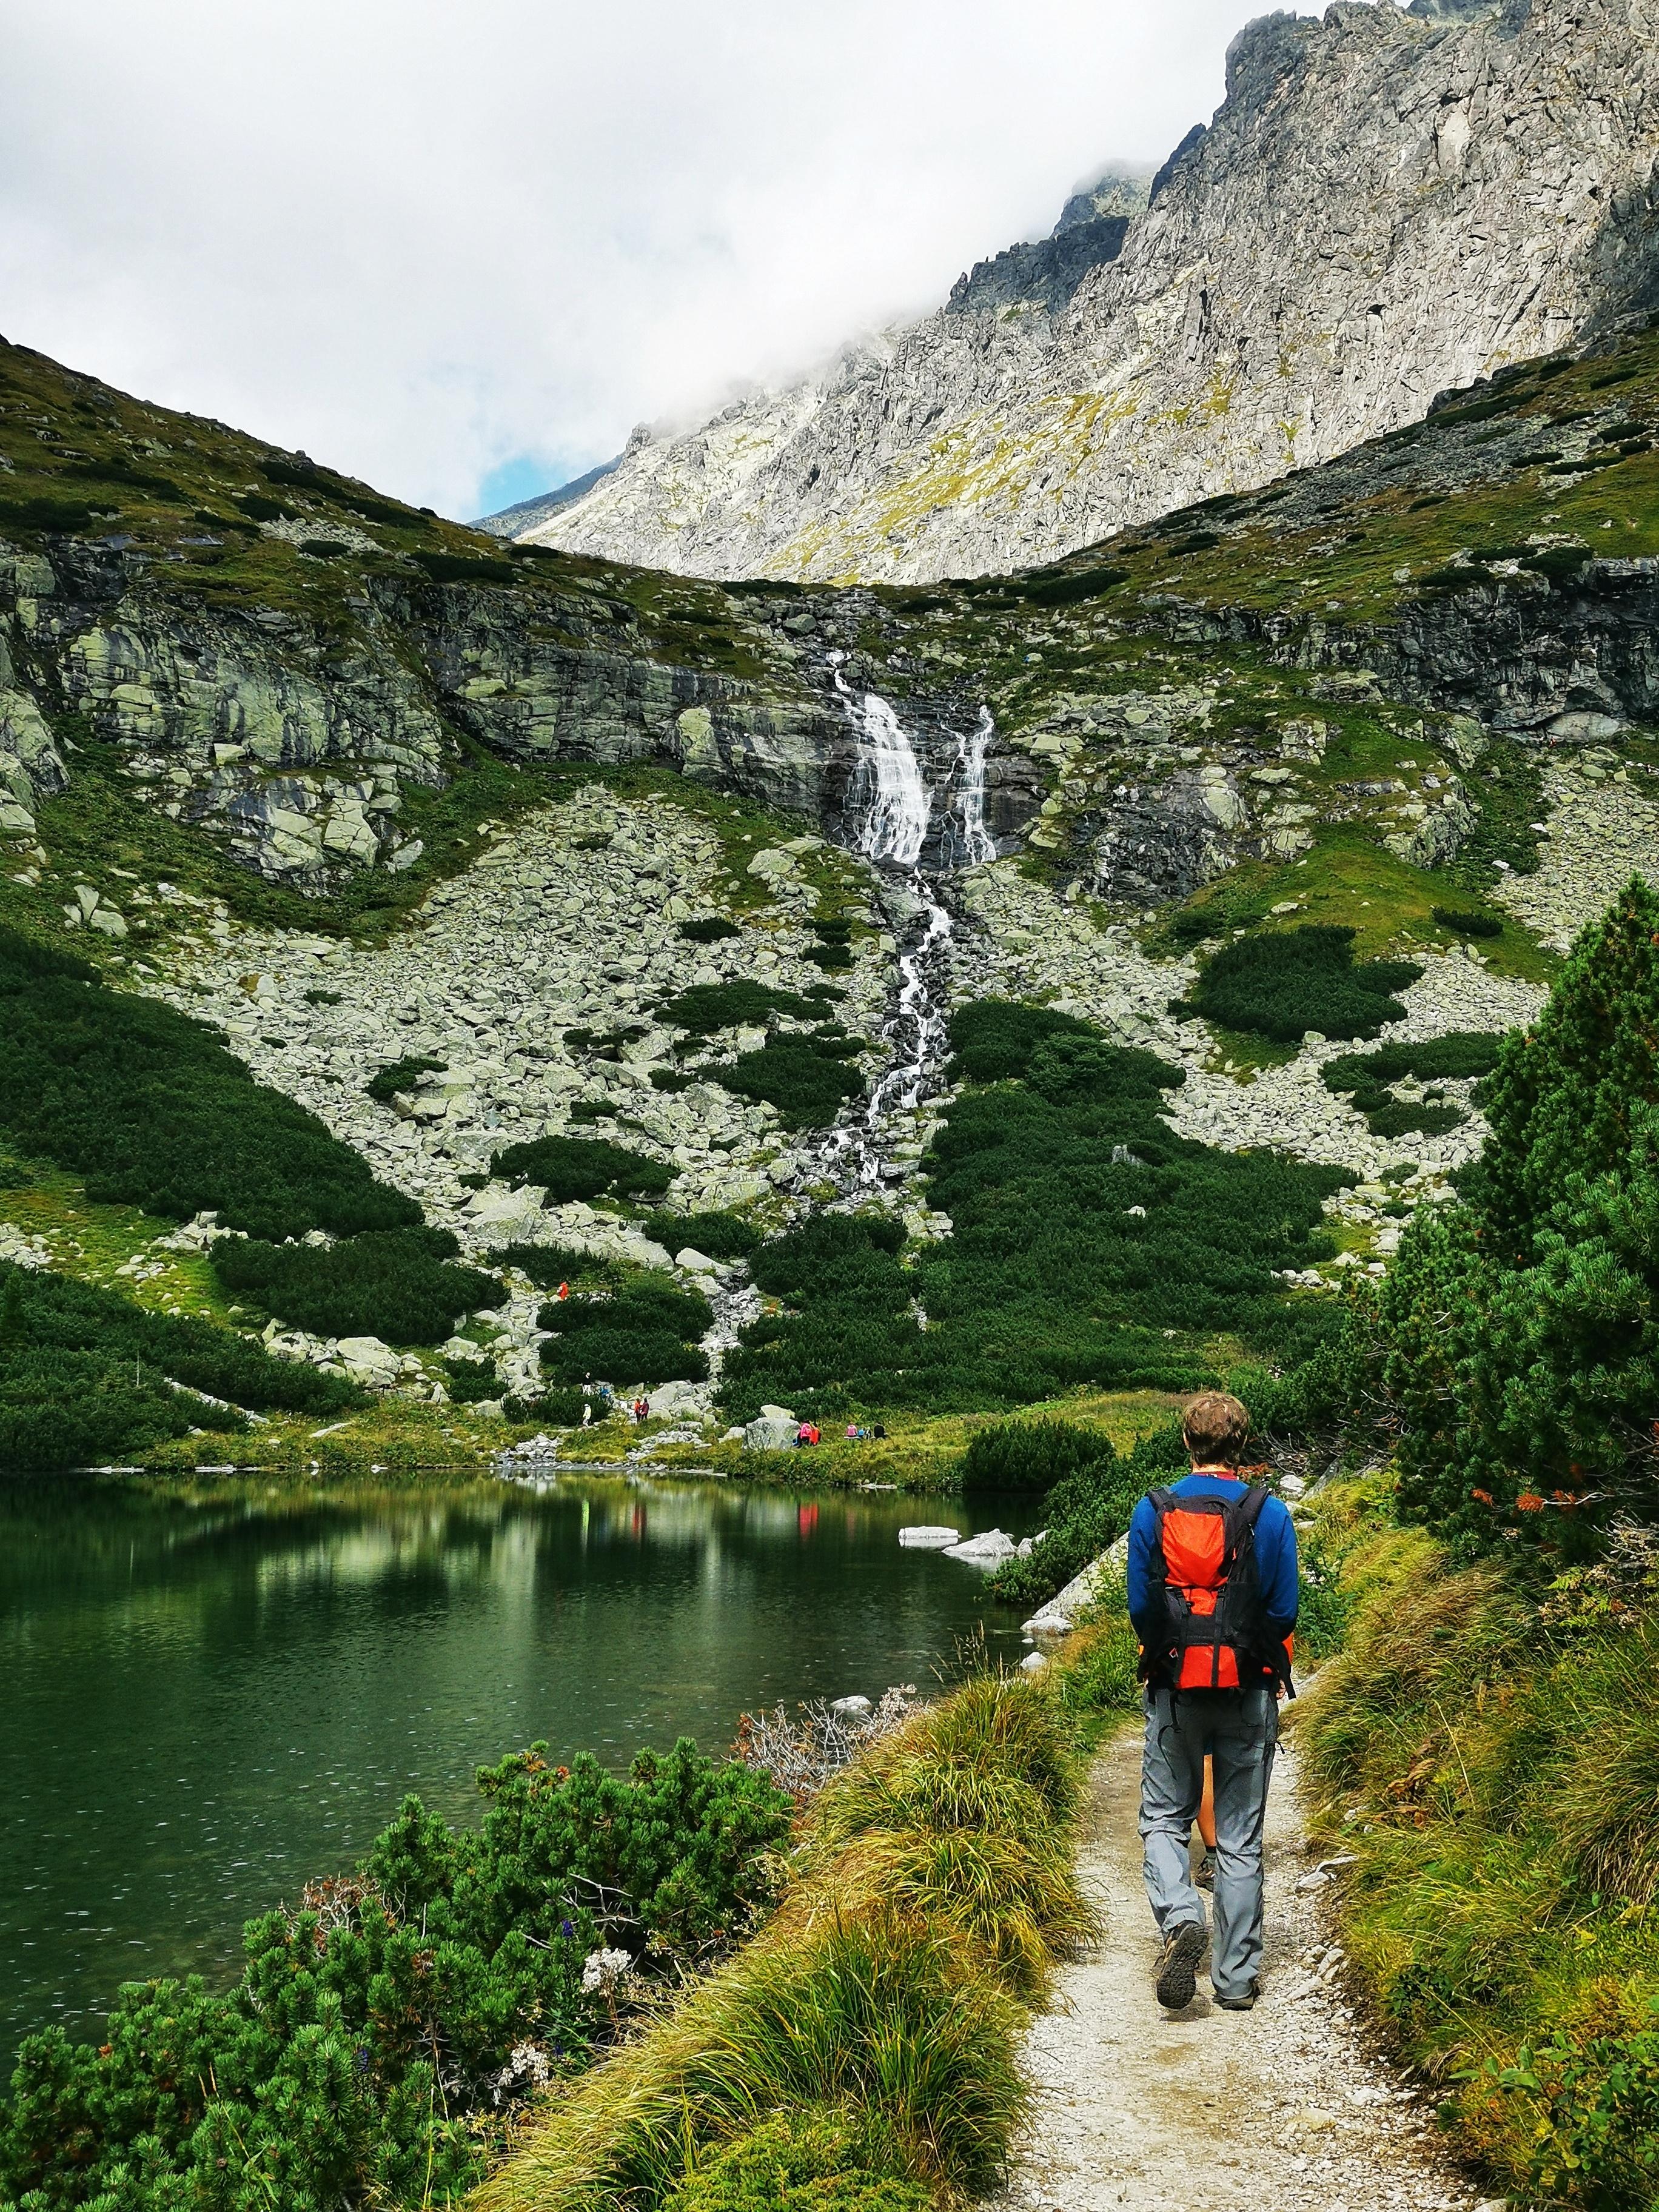 Walking past the Velické pleso mountain lake.